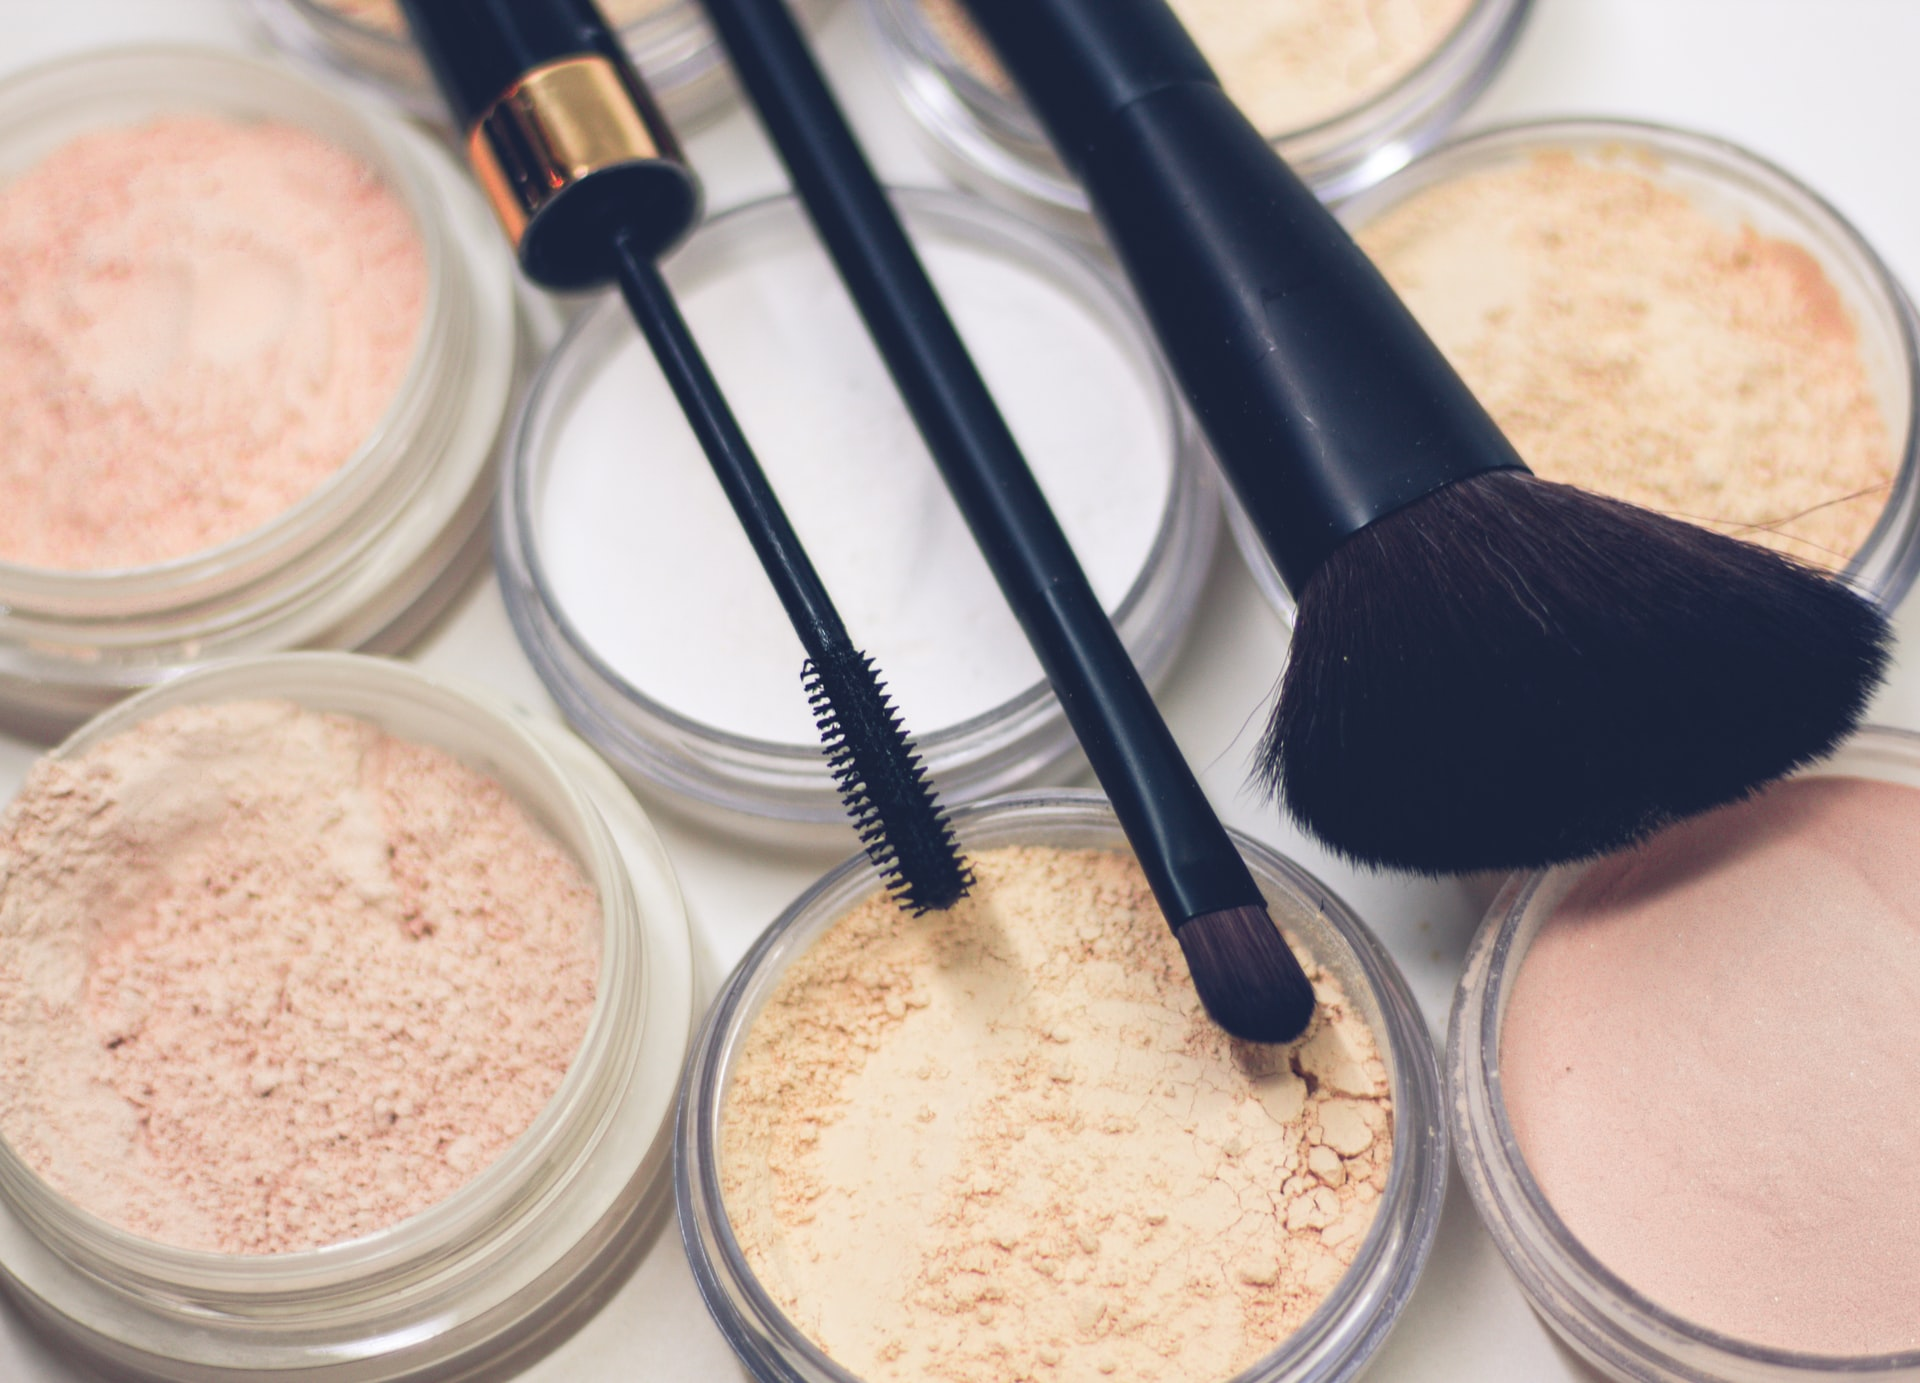 maquillaje con tones pieles